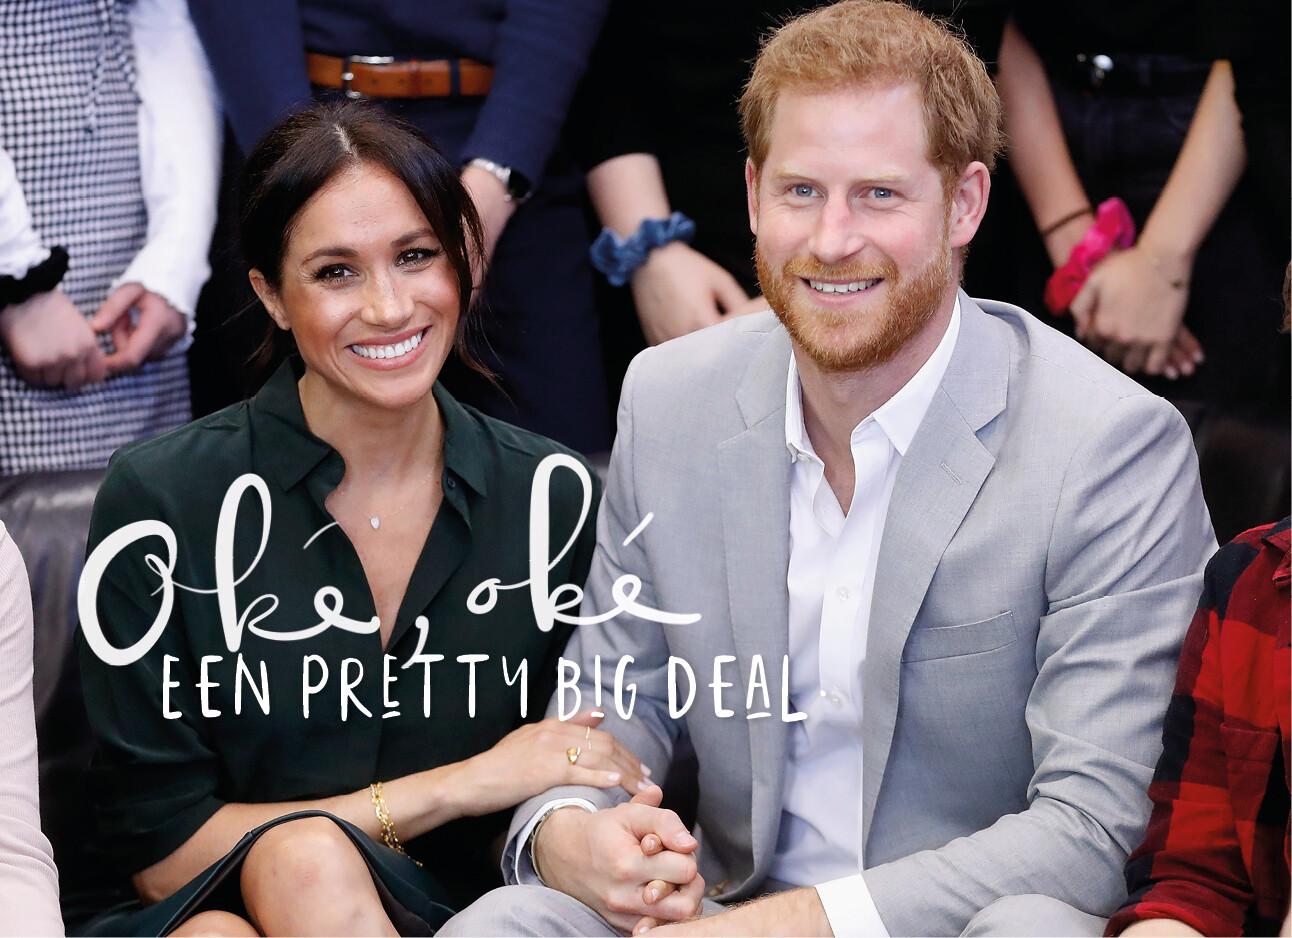 Meghan markle en prins harry lachend